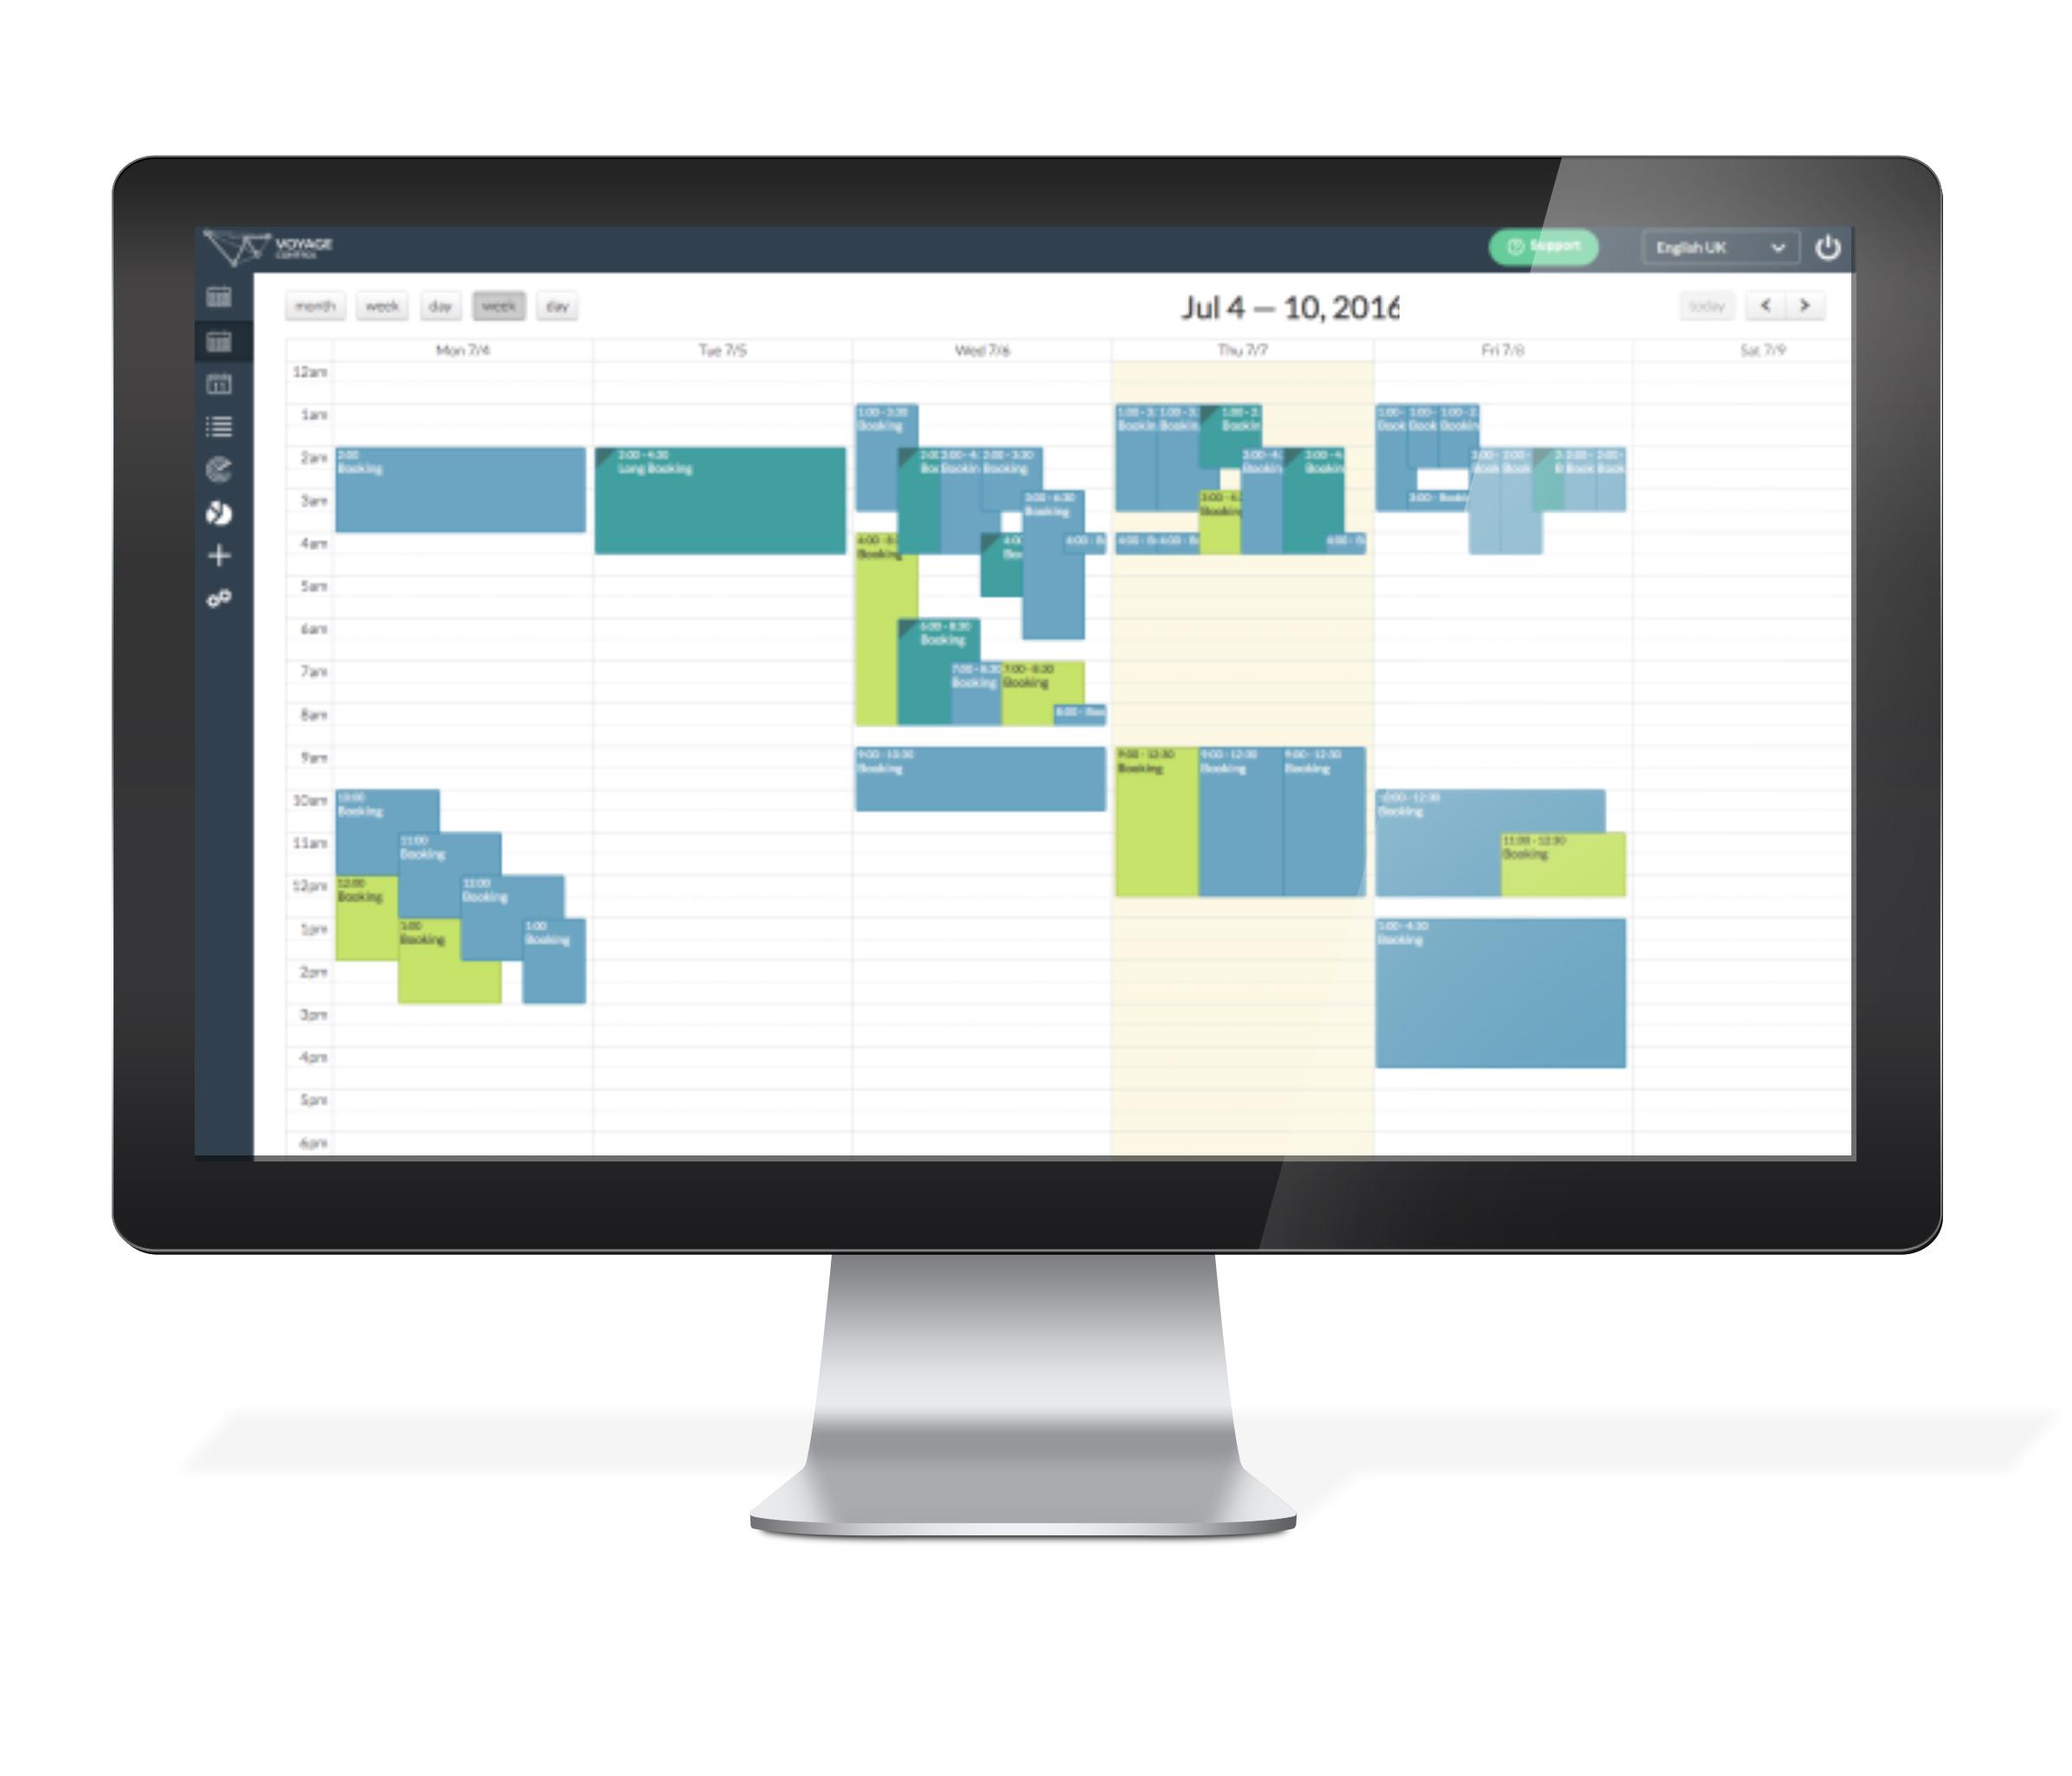 Voyage control desktop calendar screenshot